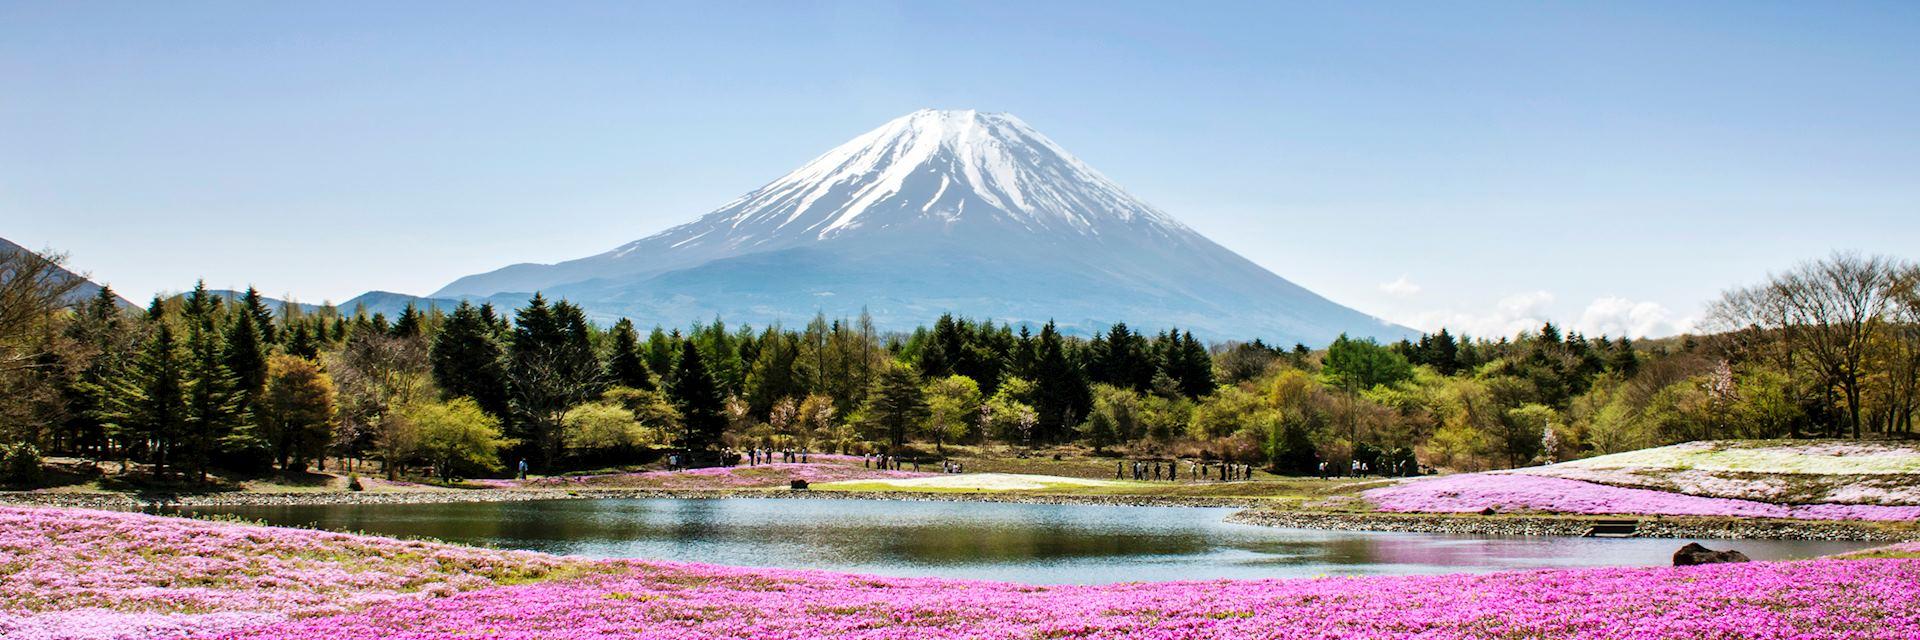 Shibazakura flowers growing around Mount Fuji